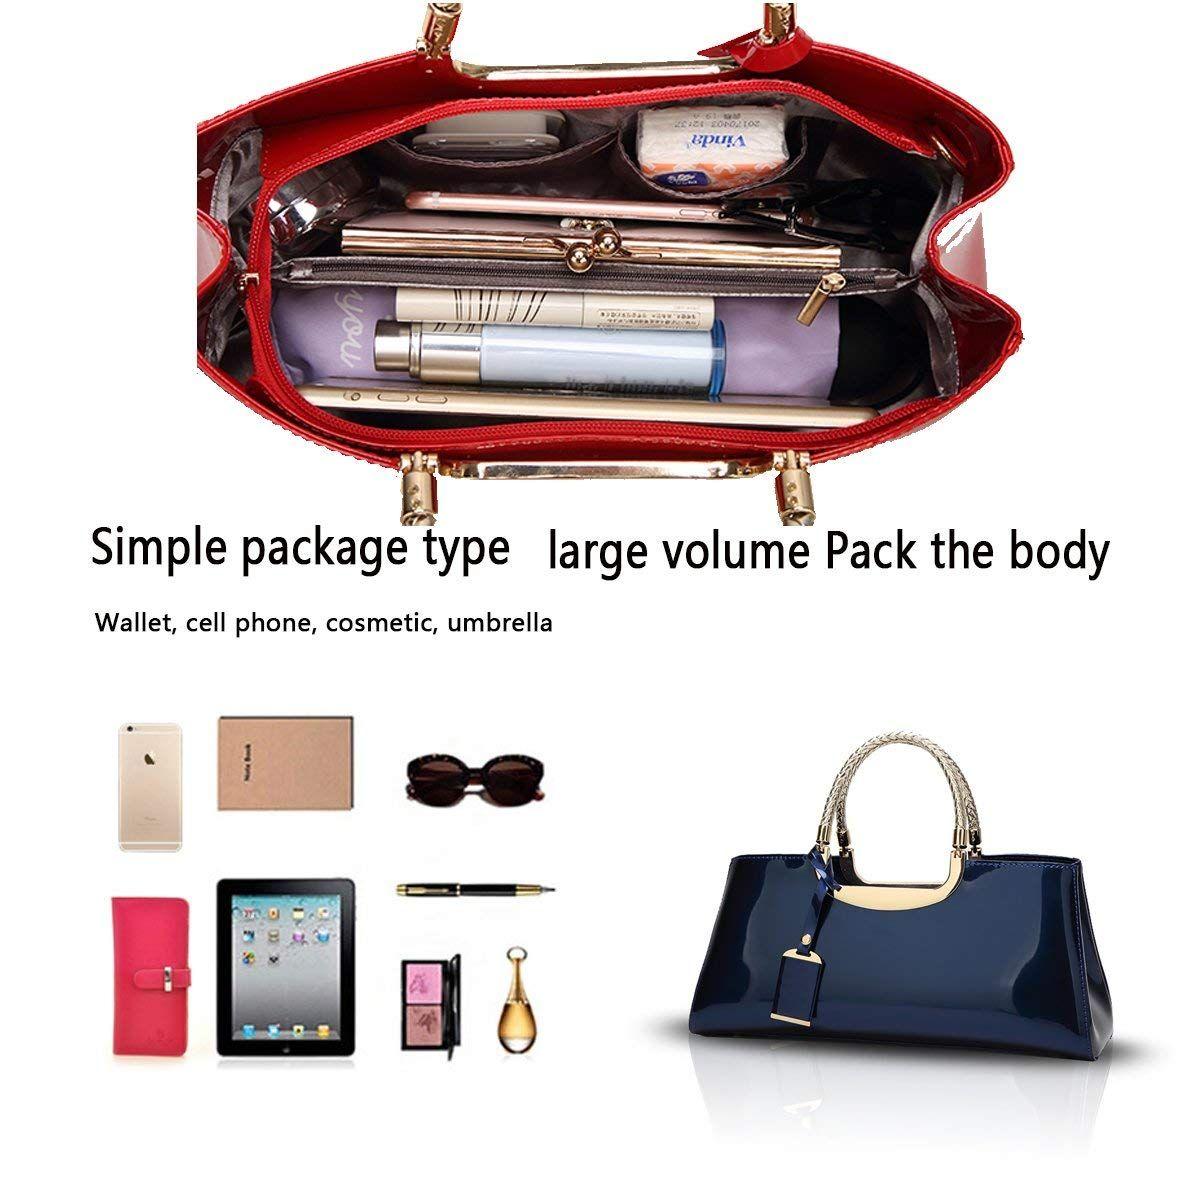 565a31e2509c70 Tisdaini 2018 Ladies Handbag Fashion Patent Leather Glossy Casual Shoulder  Messenger Bag Wallet Ladies Atmosphere Wild